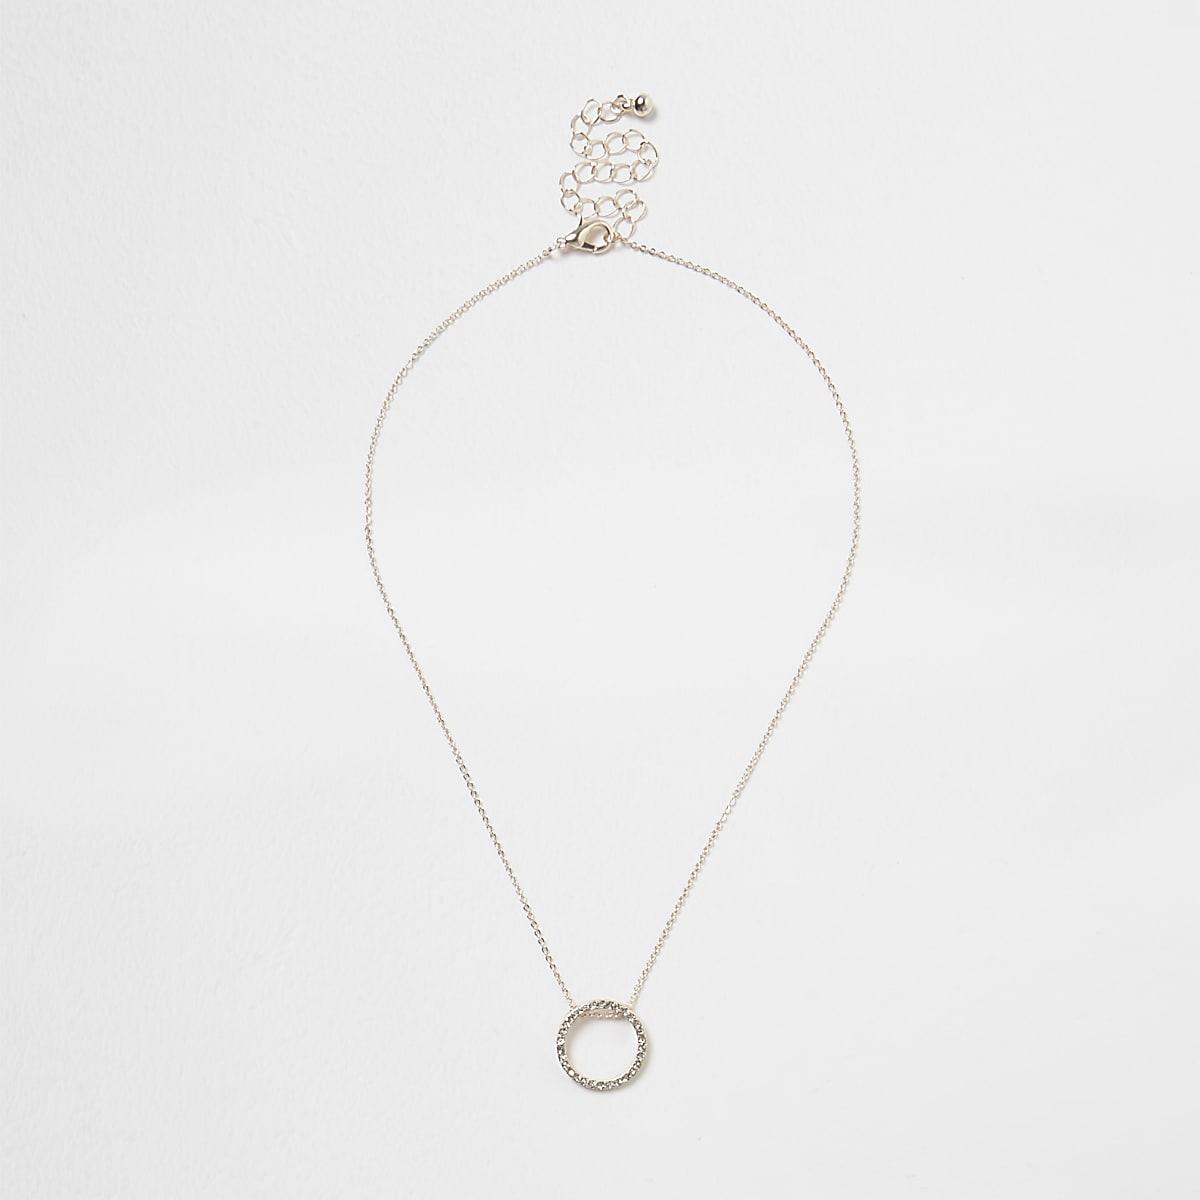 Rose gold tone diamante pave circle necklace